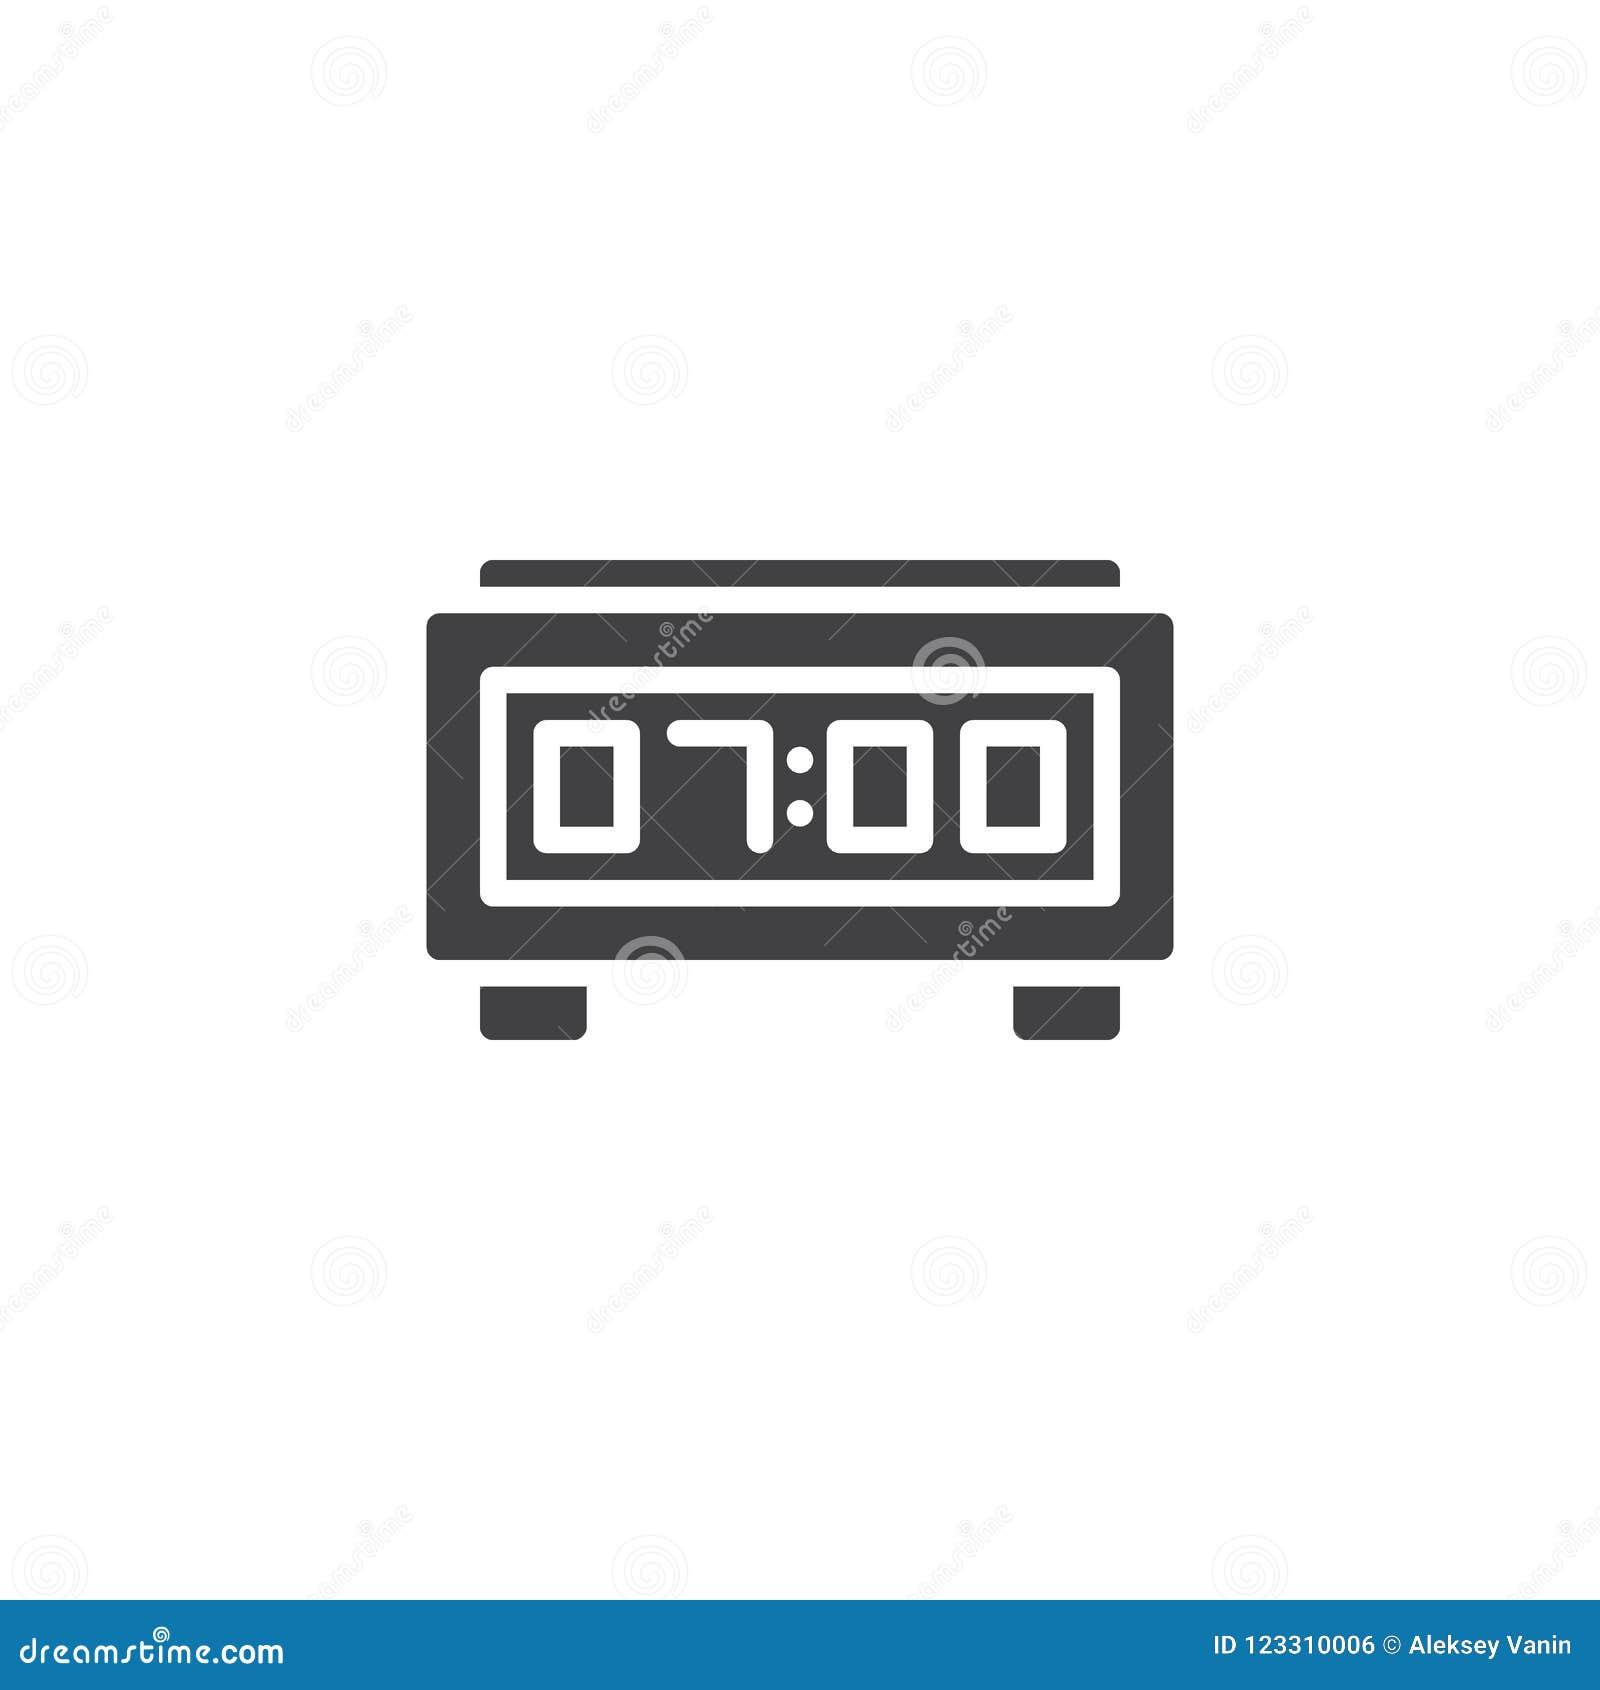 Digital Alarm Clock Vector Icon Stock Vector - Illustration of